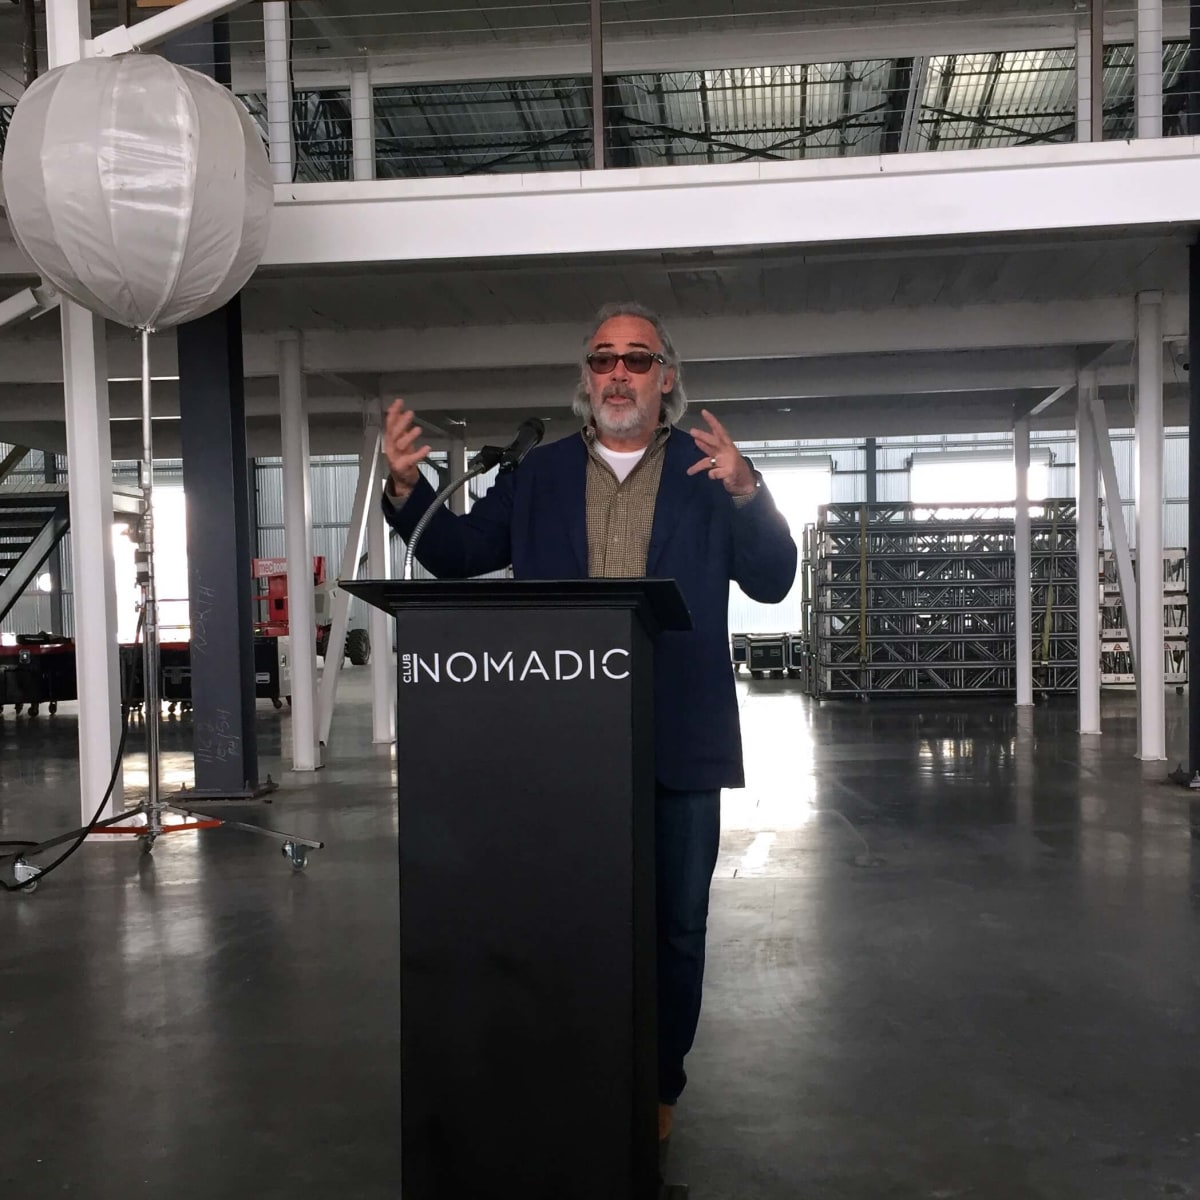 Houston, Club Nomadic nightclub Super Bowl LI, Club nomadic president Jack Murphy